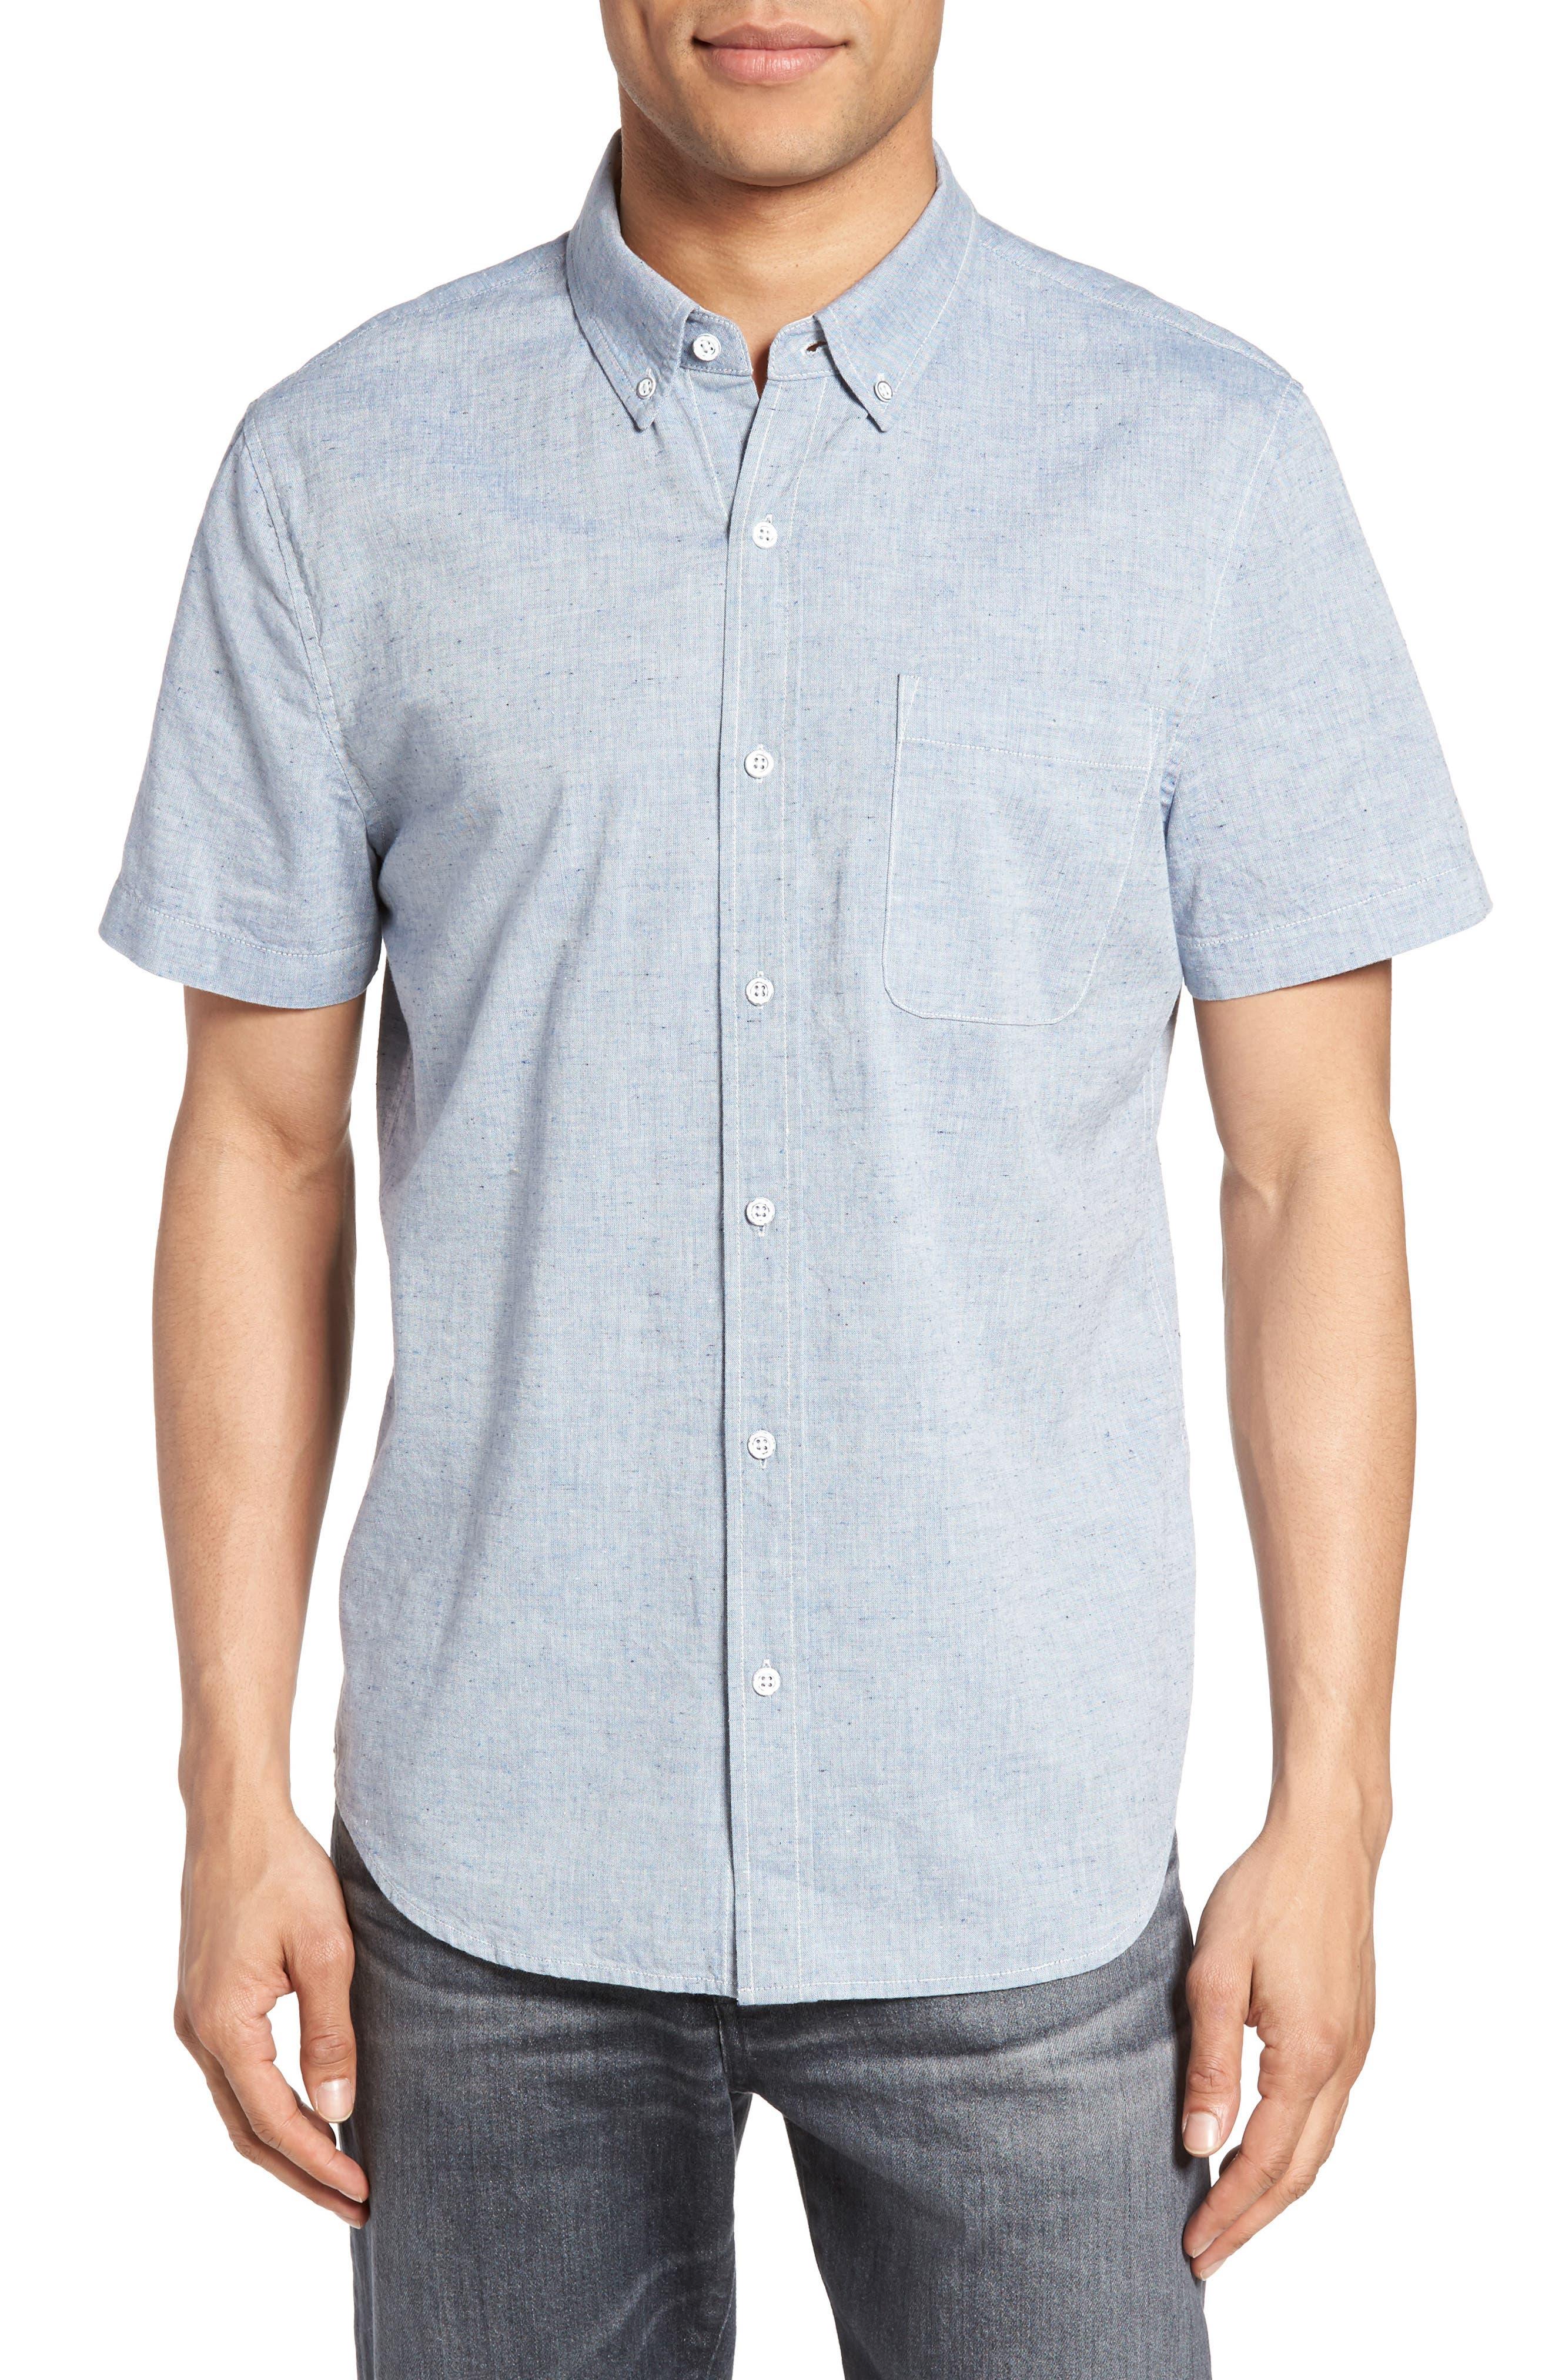 Alternate Image 1 Selected - AG Nash Slub Cotton Shirt